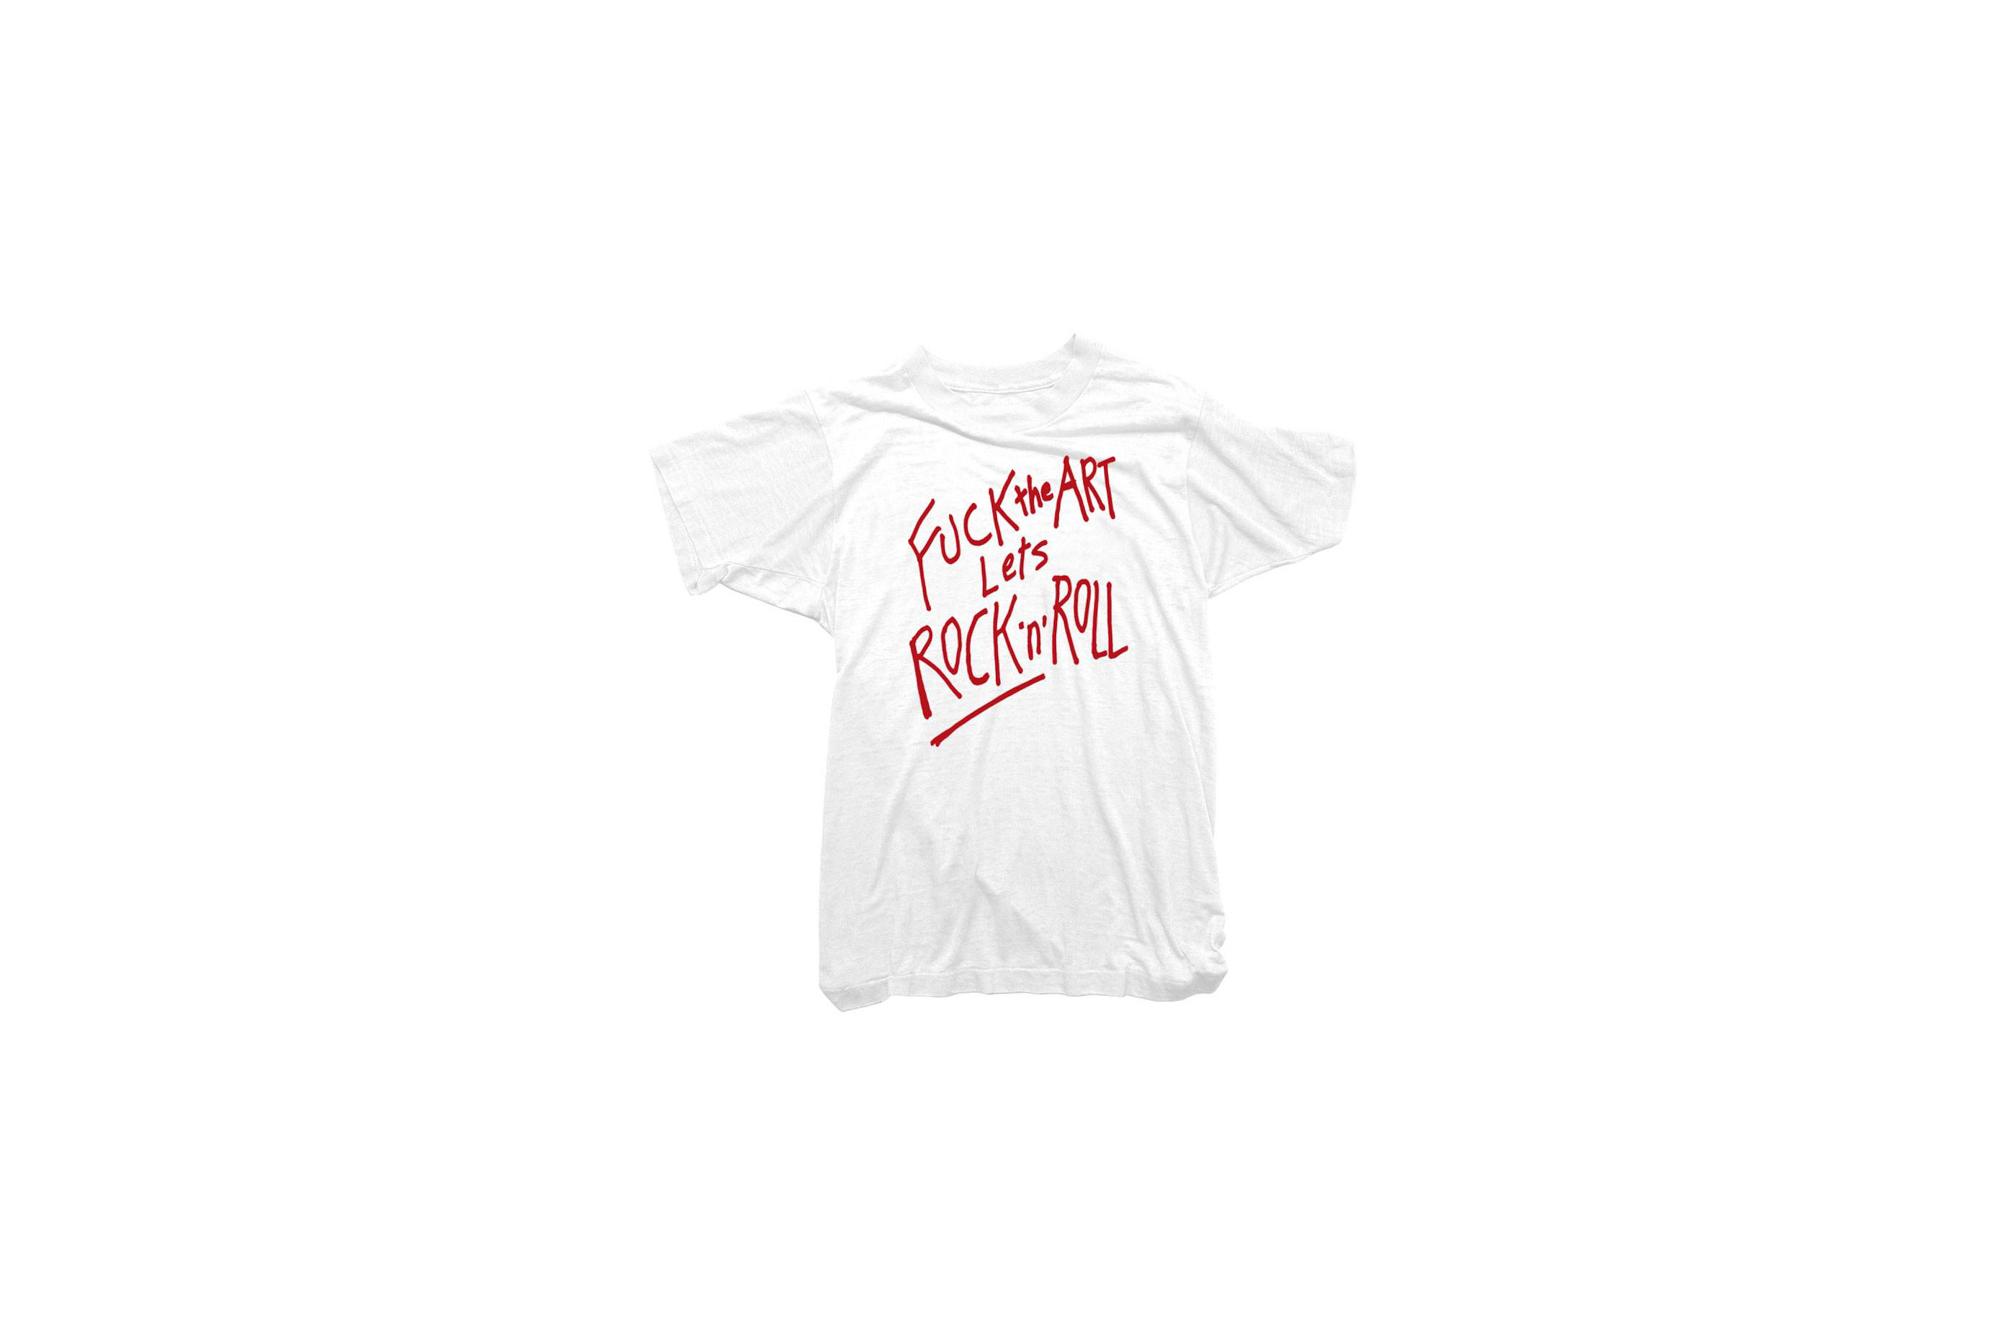 WORN FREE (ウォーンフリー) FUCK the ART Lets ROCK'n'ROLL Rod Stewart(ロッド・スチュワート) 1985 NEW YORK ロックTシャツ WHITE (ホワイト) MADE IN USA (アメリカ製) 2018春夏 wornfree ウォーンフリー 愛知 名古屋 Alto e Diritto アルト エ デリット nirvana kurtcobain bandtee rocktee